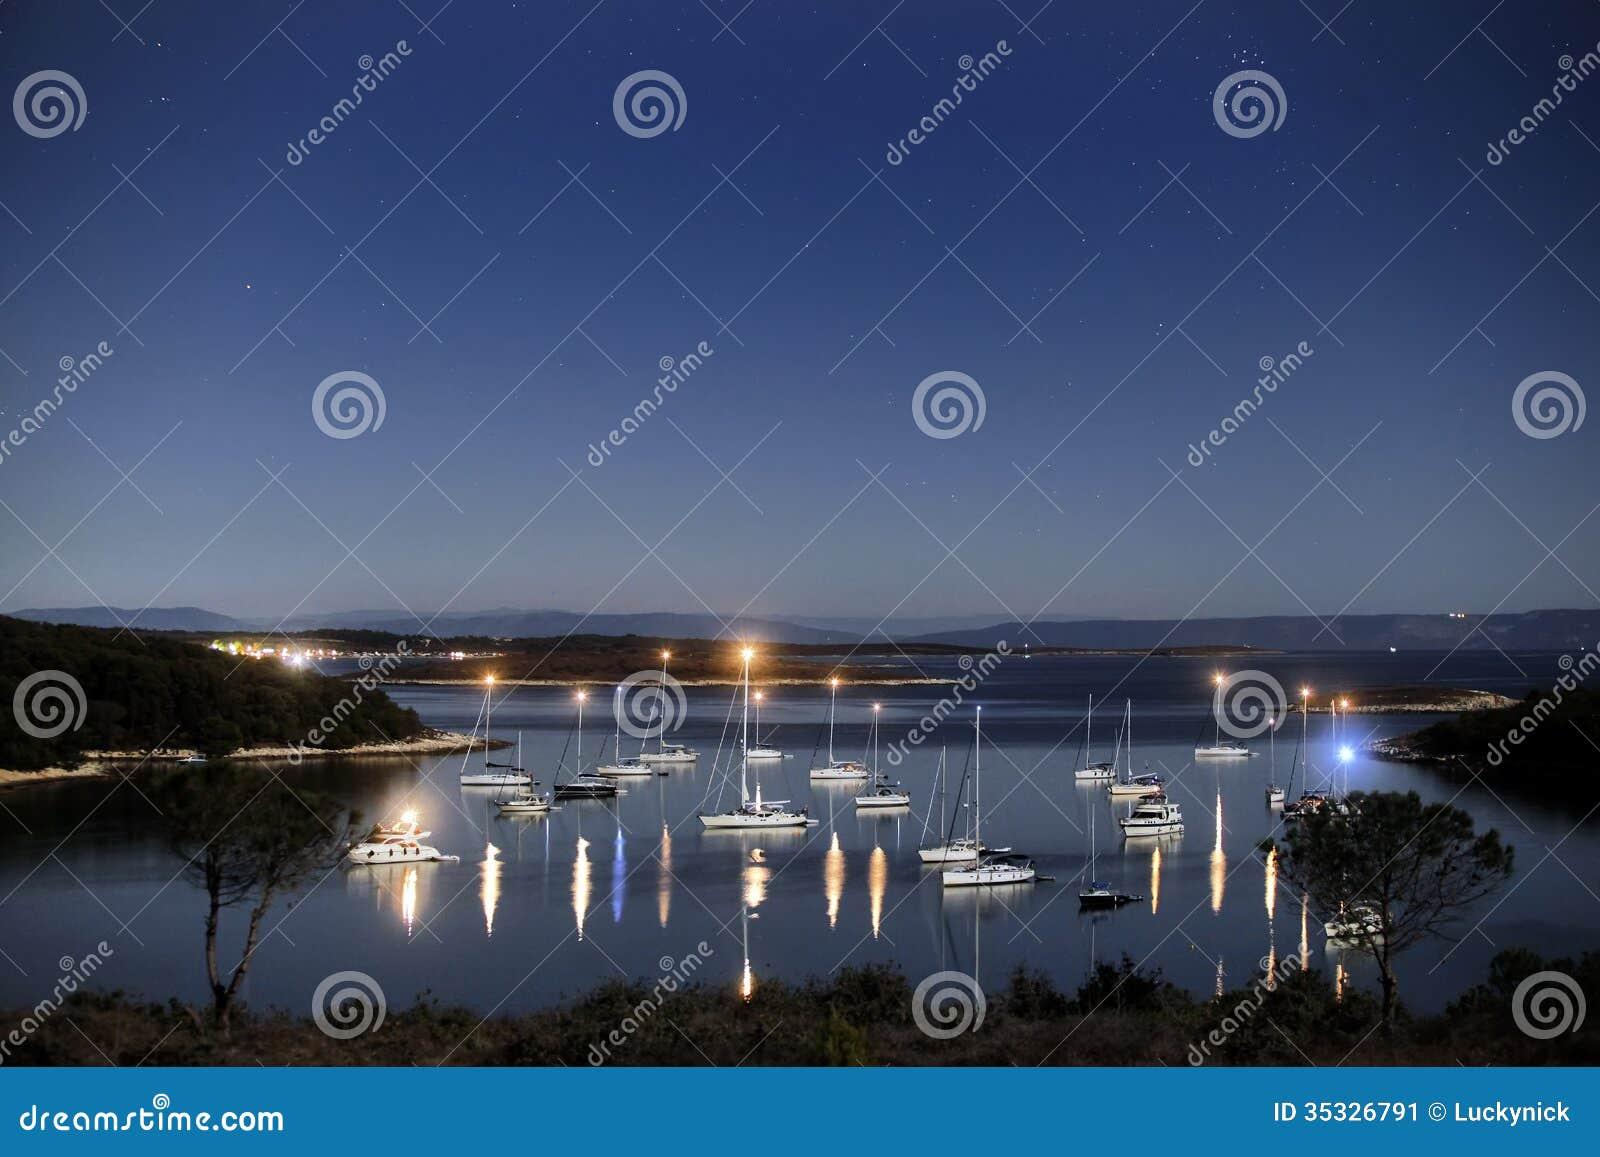 Lagoon date night in Melbourne